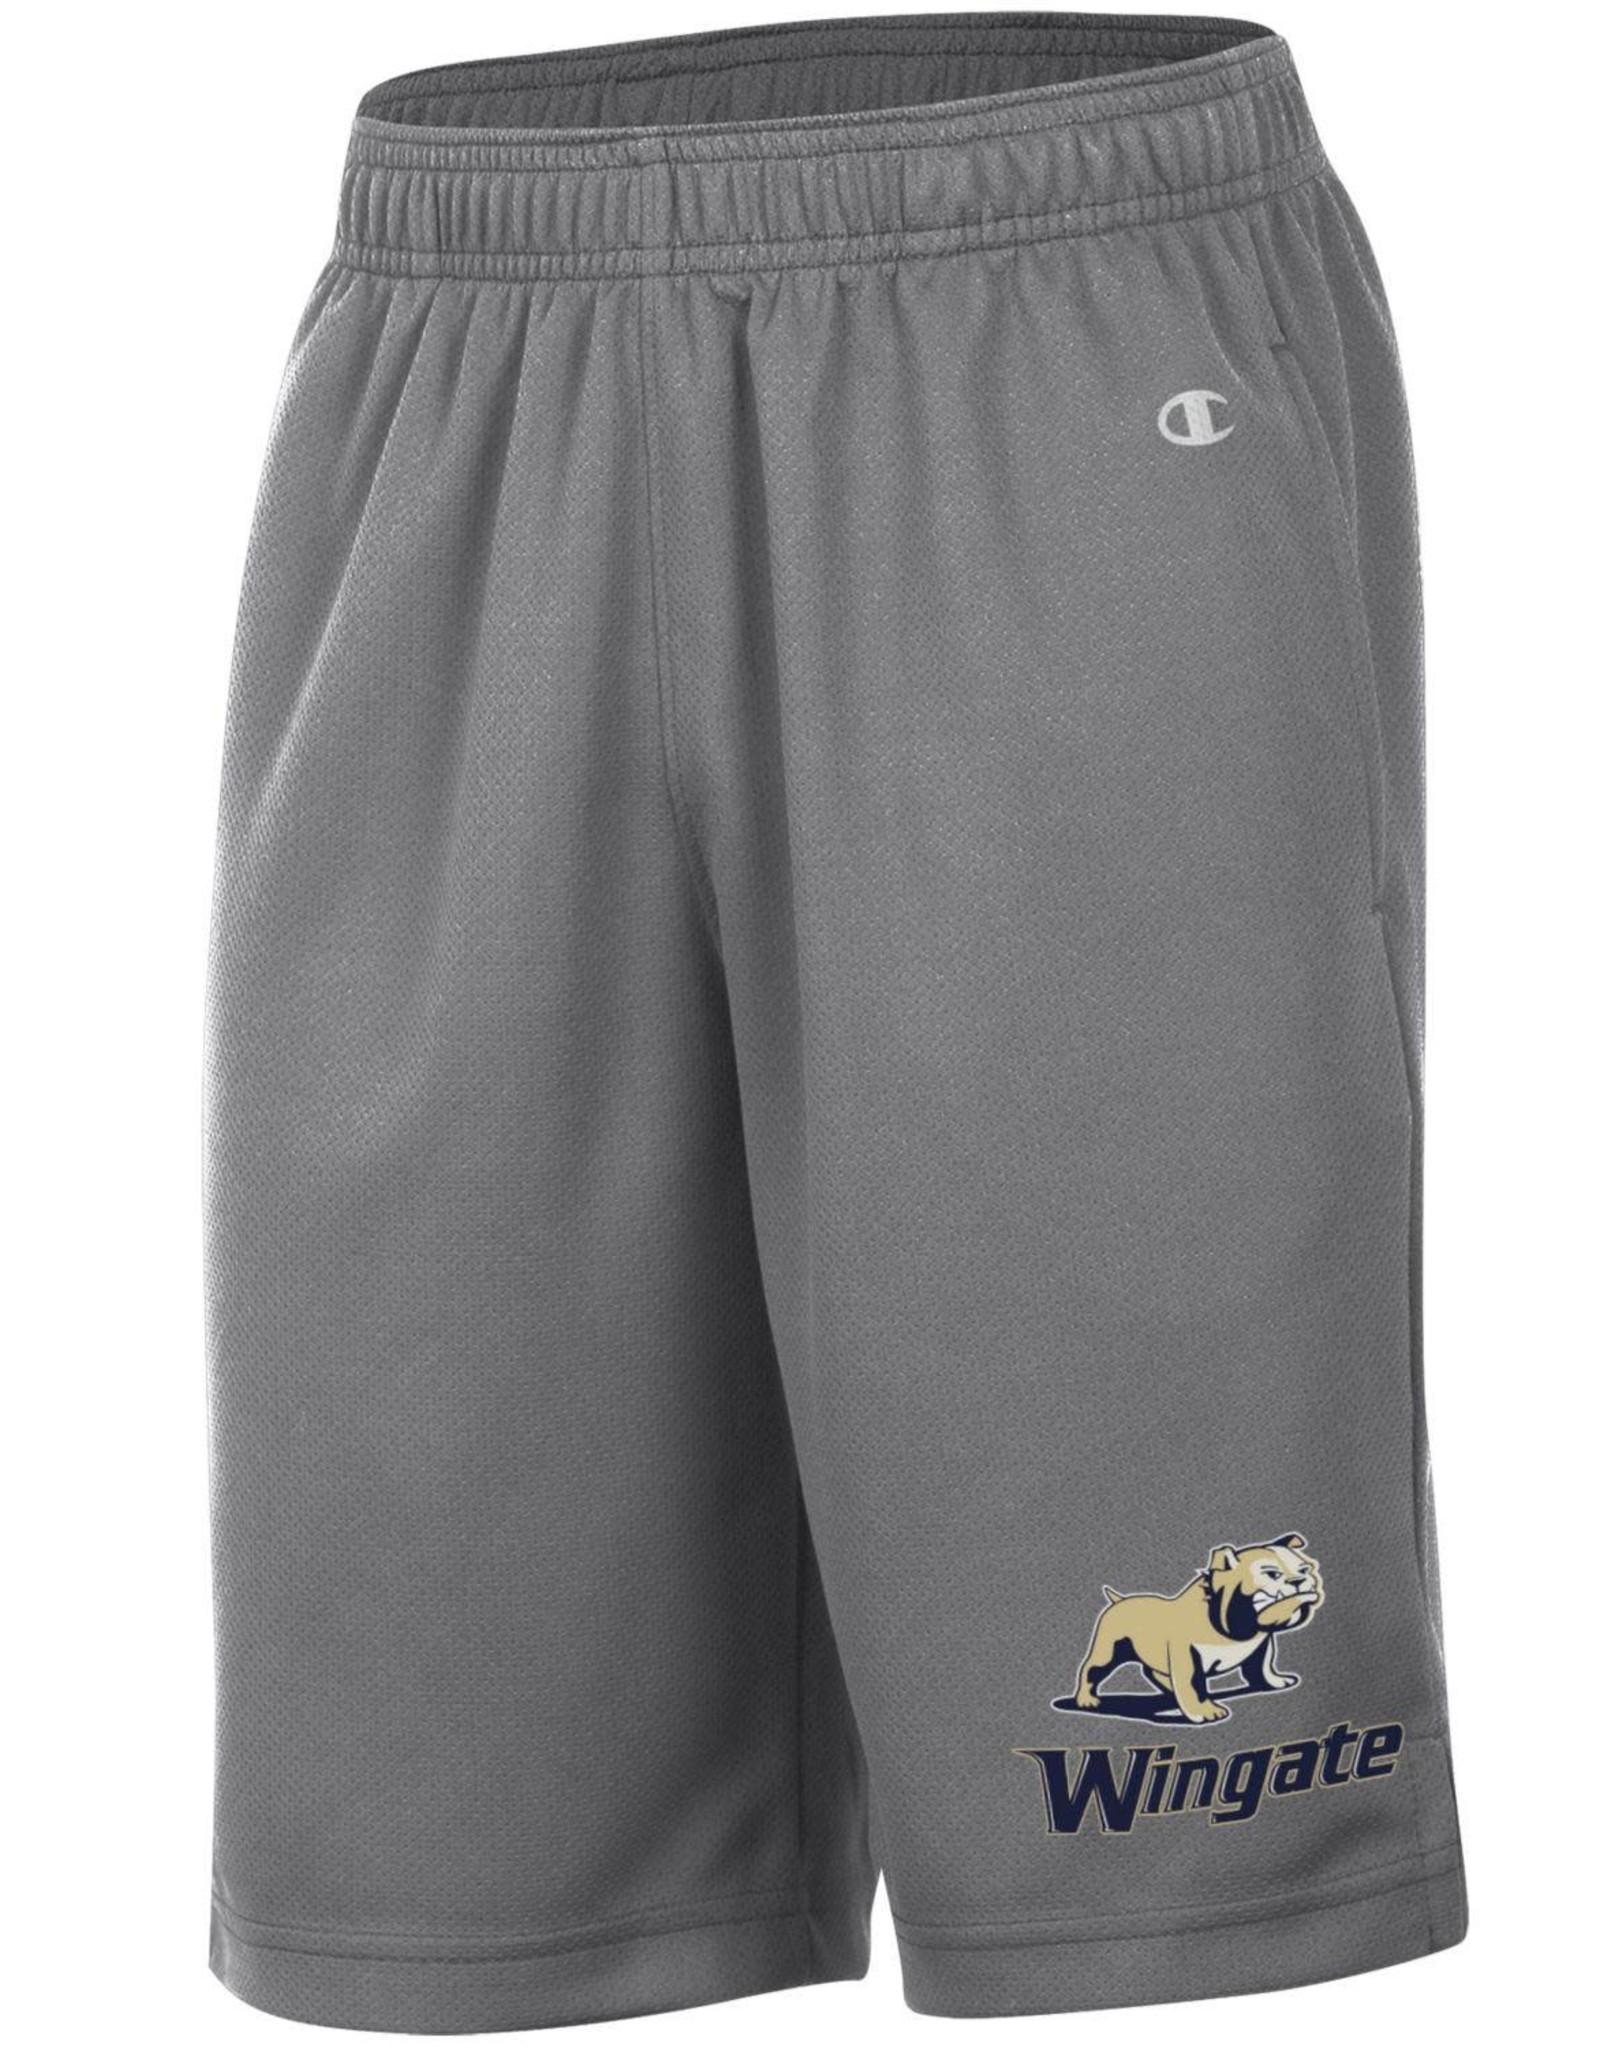 Champion Youth Grey Mesh Shorts